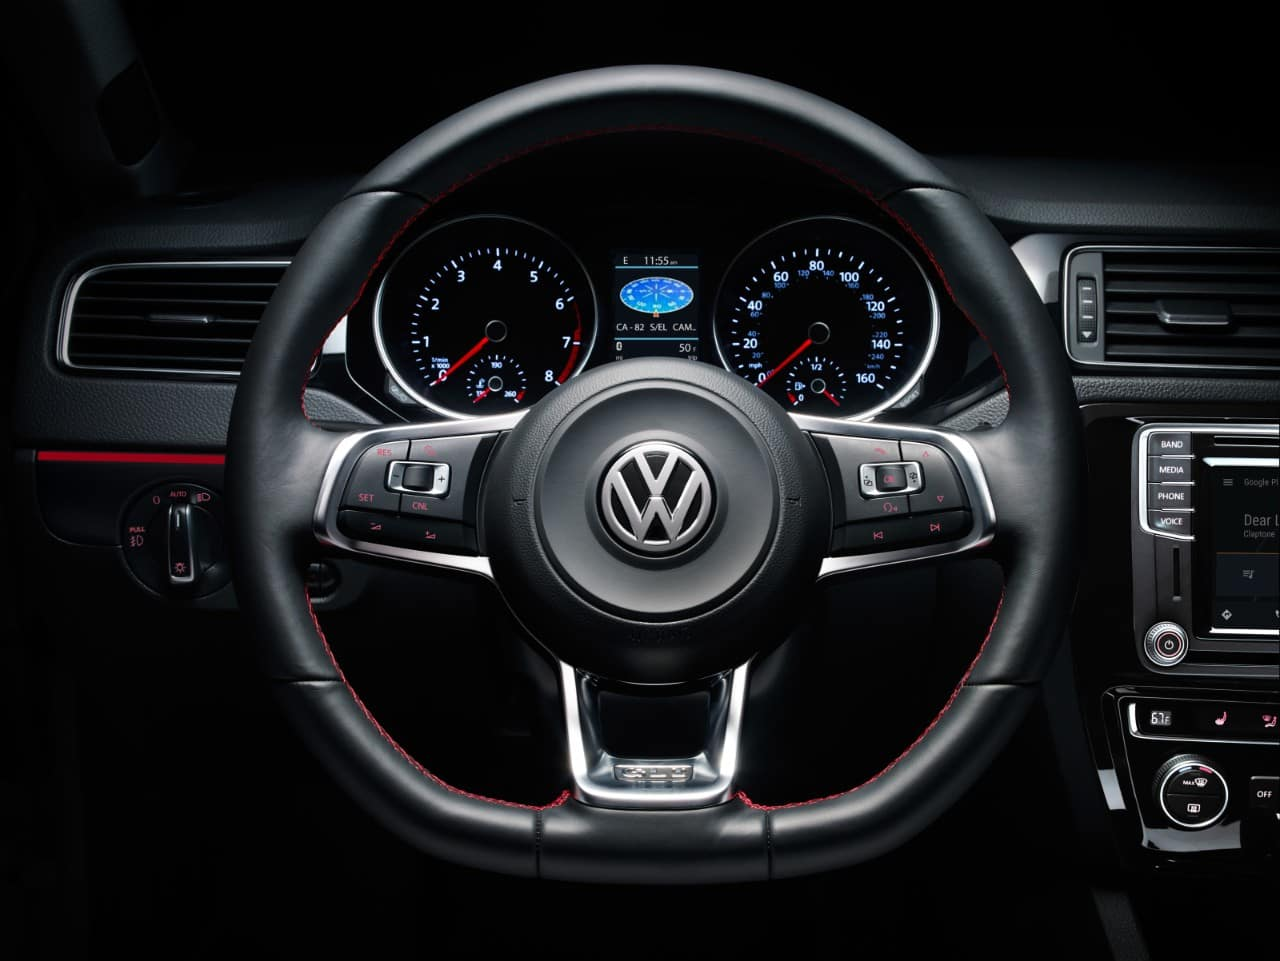 2017 Volkswagen Jetta Interior Steering Wheel Detail